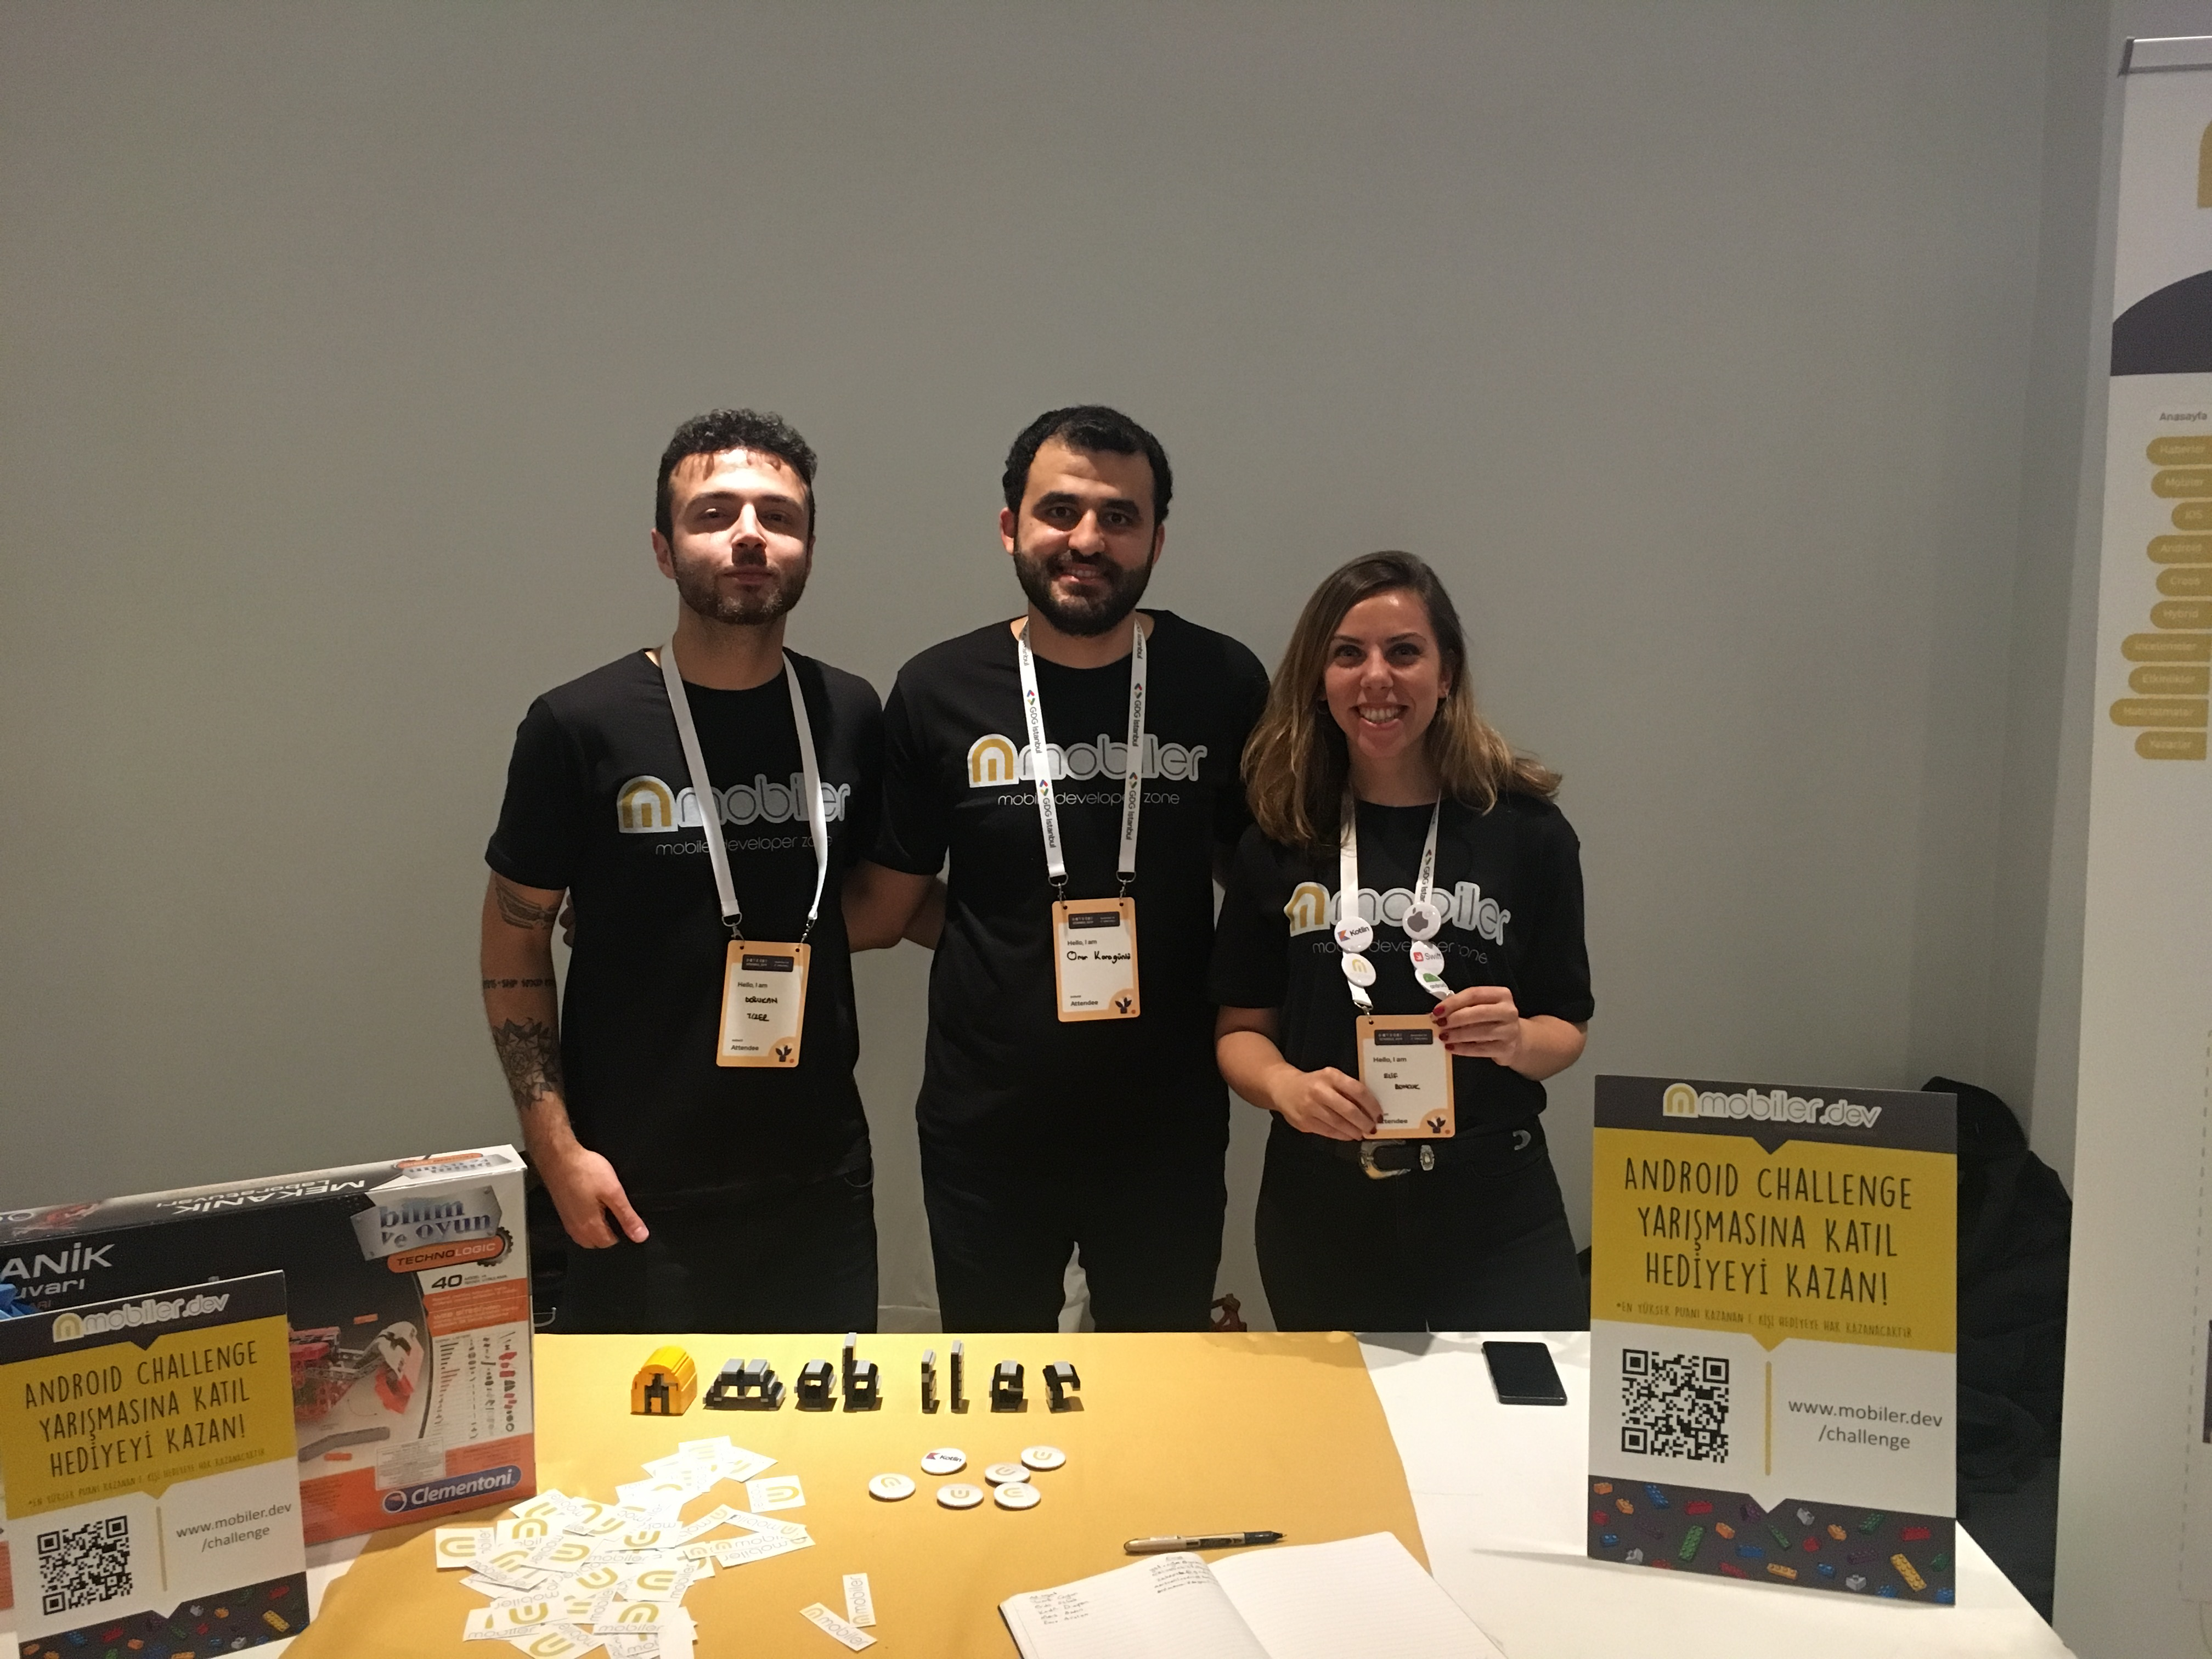 Devfest İstanbul 2019